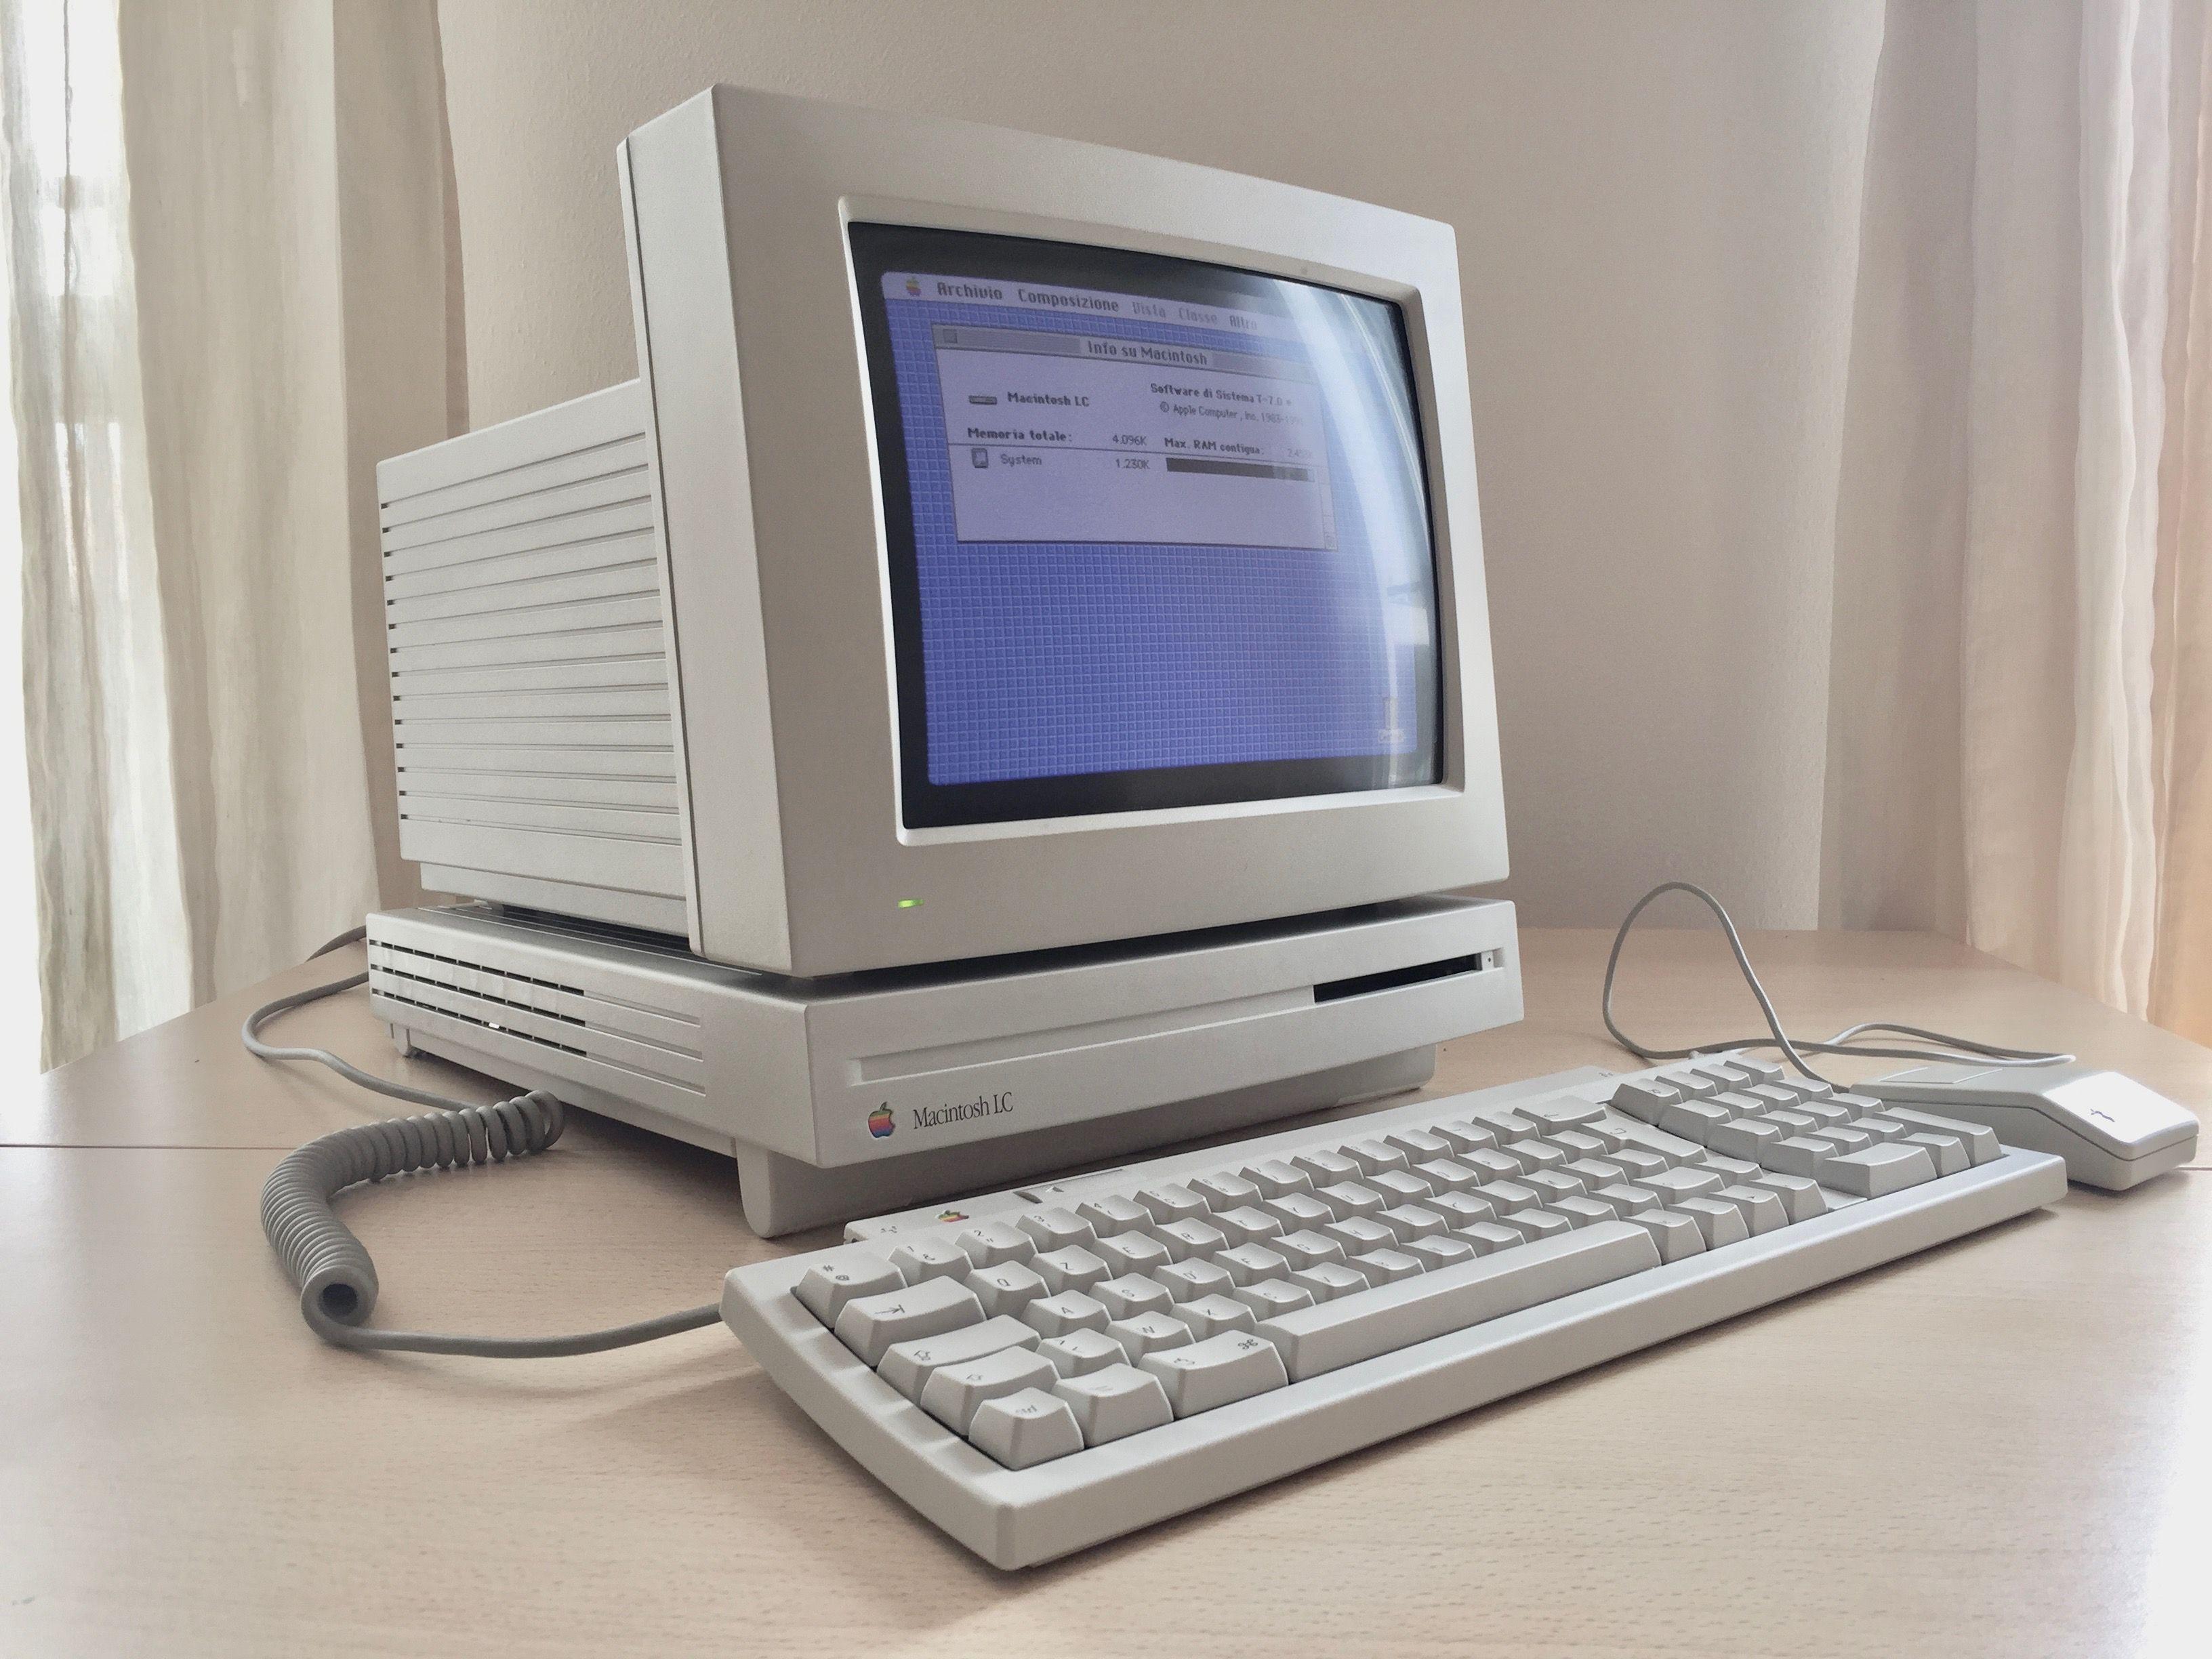 d5a67957f76 1990) Macintosh LC | Vintage Apple Computers in 2019 | Apple mac ...